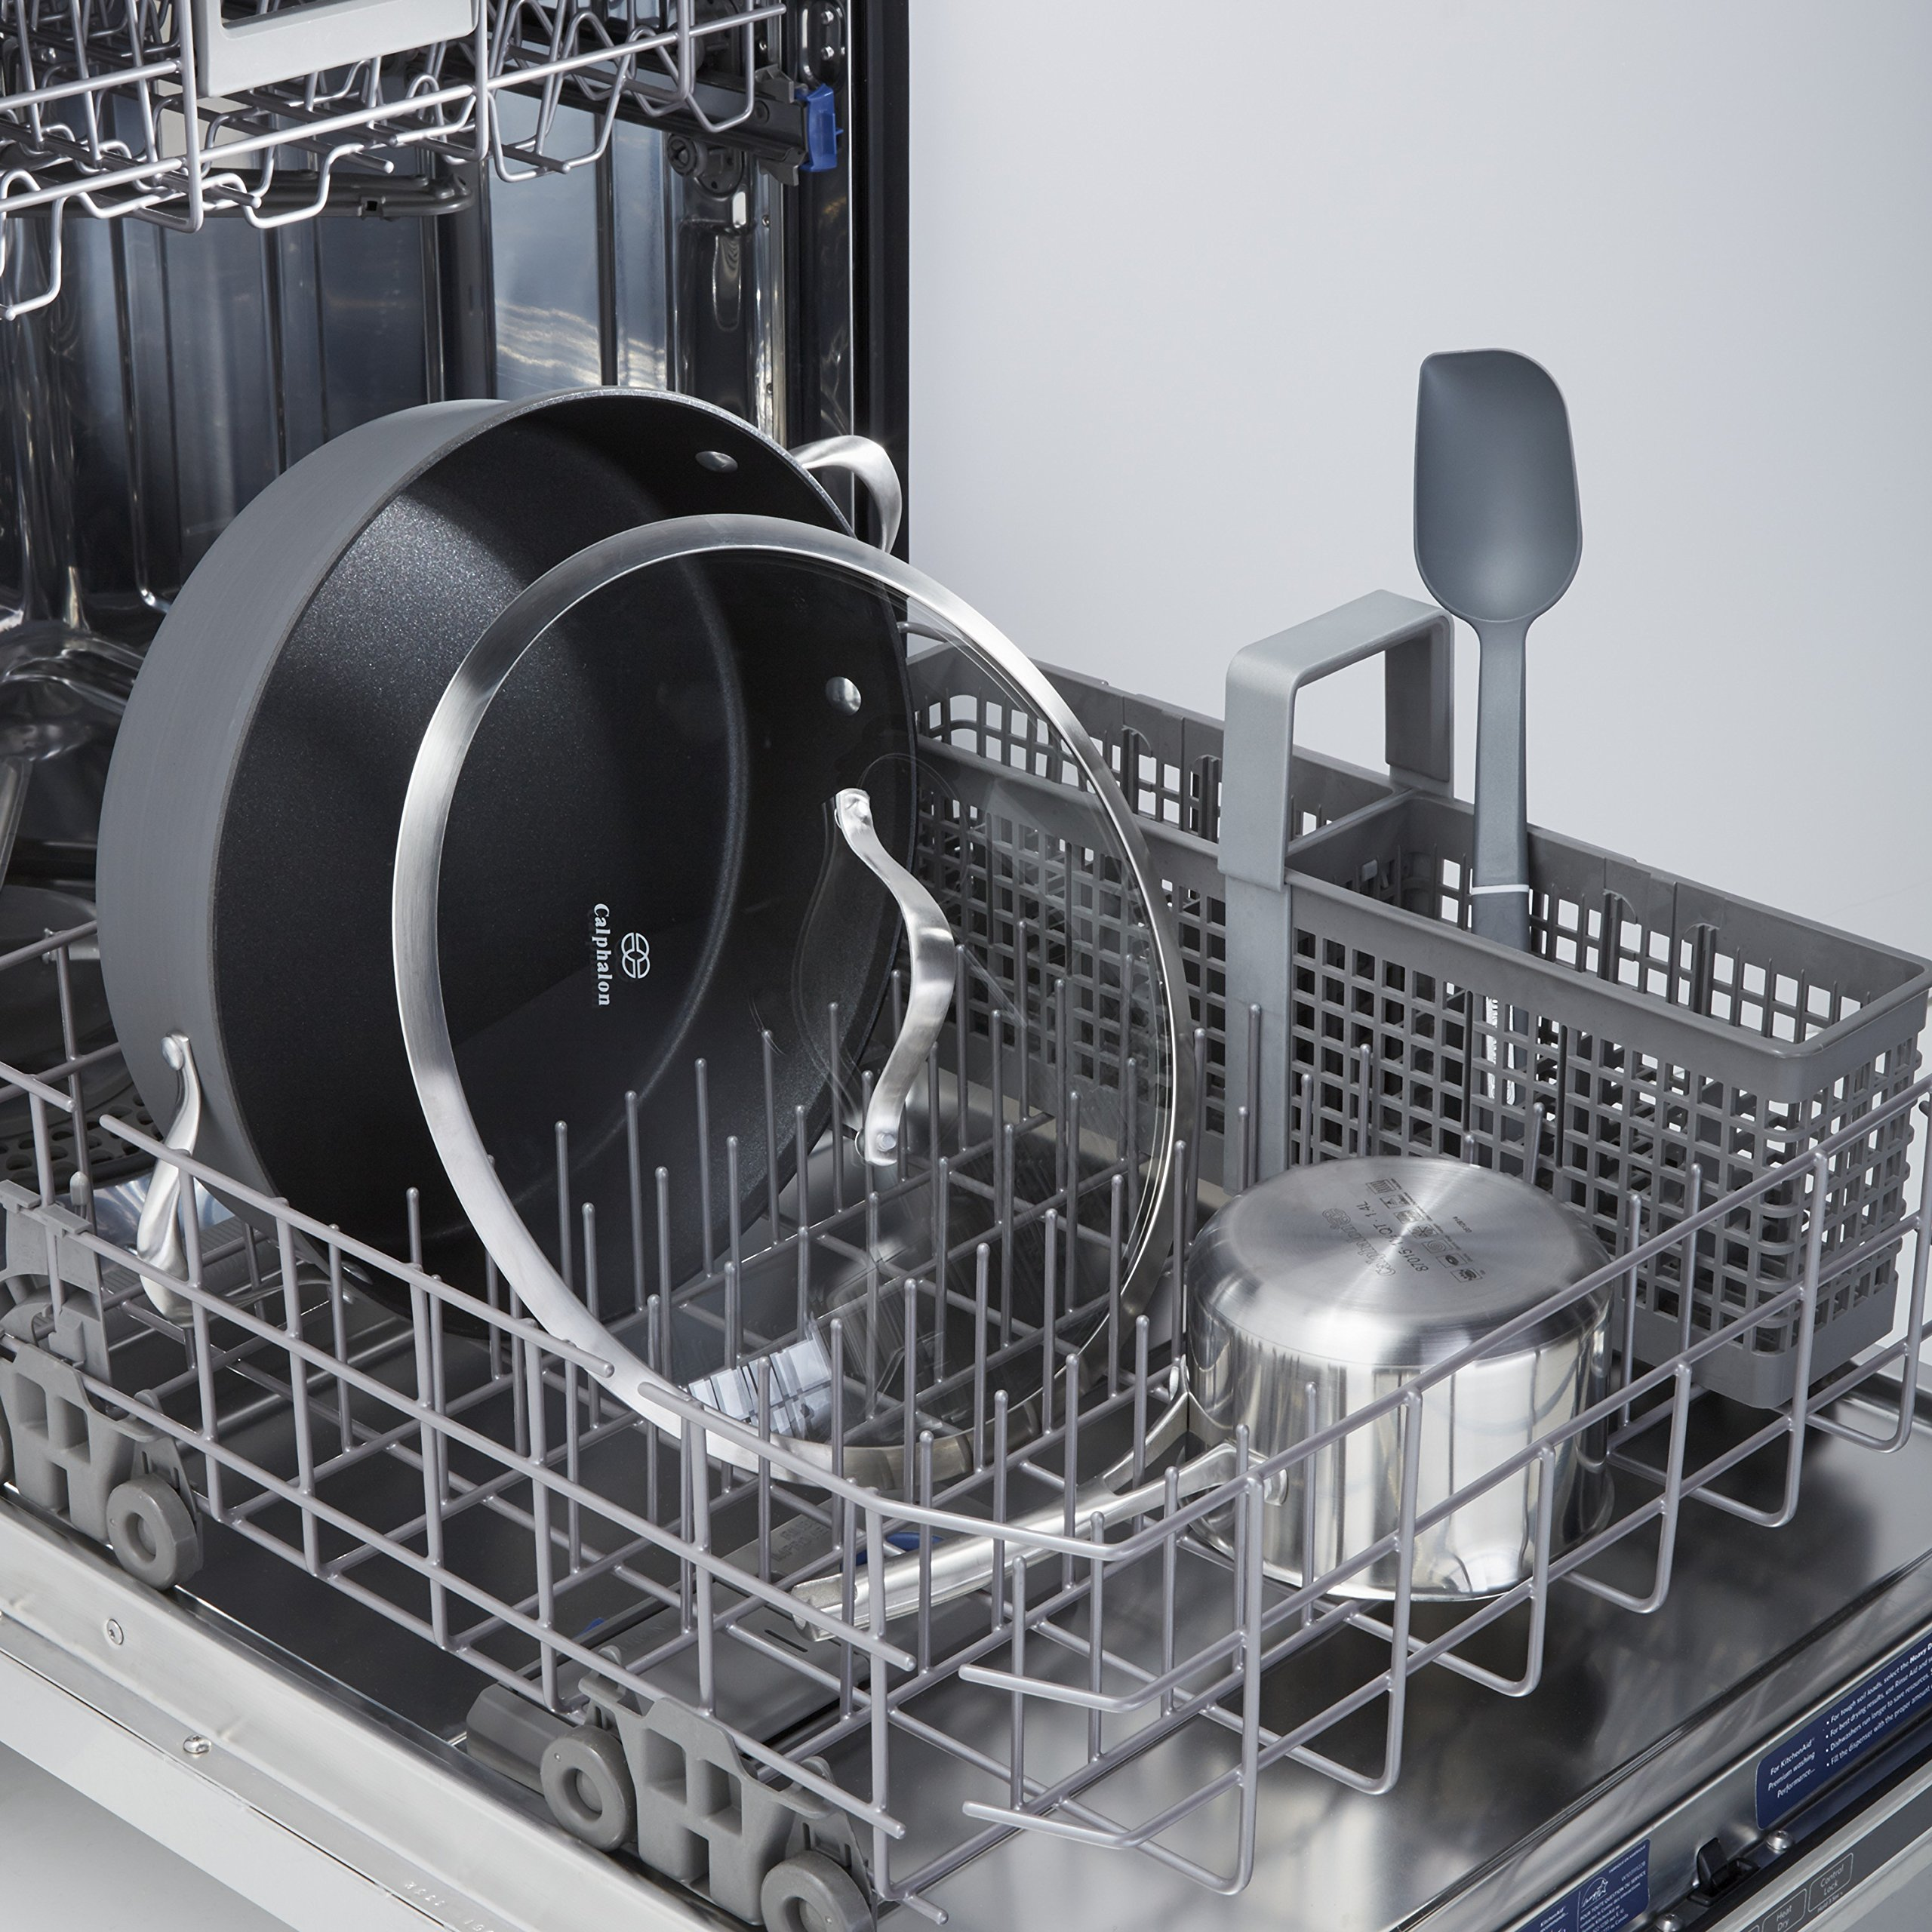 Calphalon Contemporary Hard-Anodized Aluminum Nonstick Cookware, Sauteuse Pan, 7-quart, Black by Calphalon (Image #3)